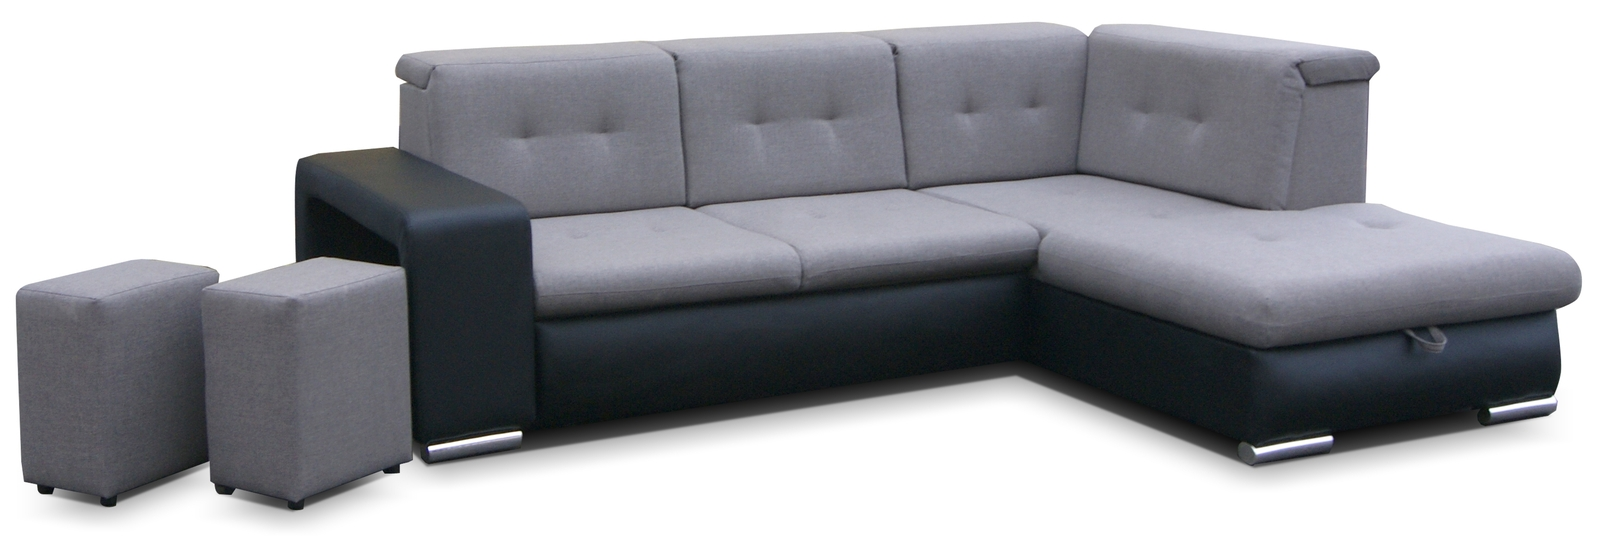 Rohová sedačka - Famm - Dawid (P)